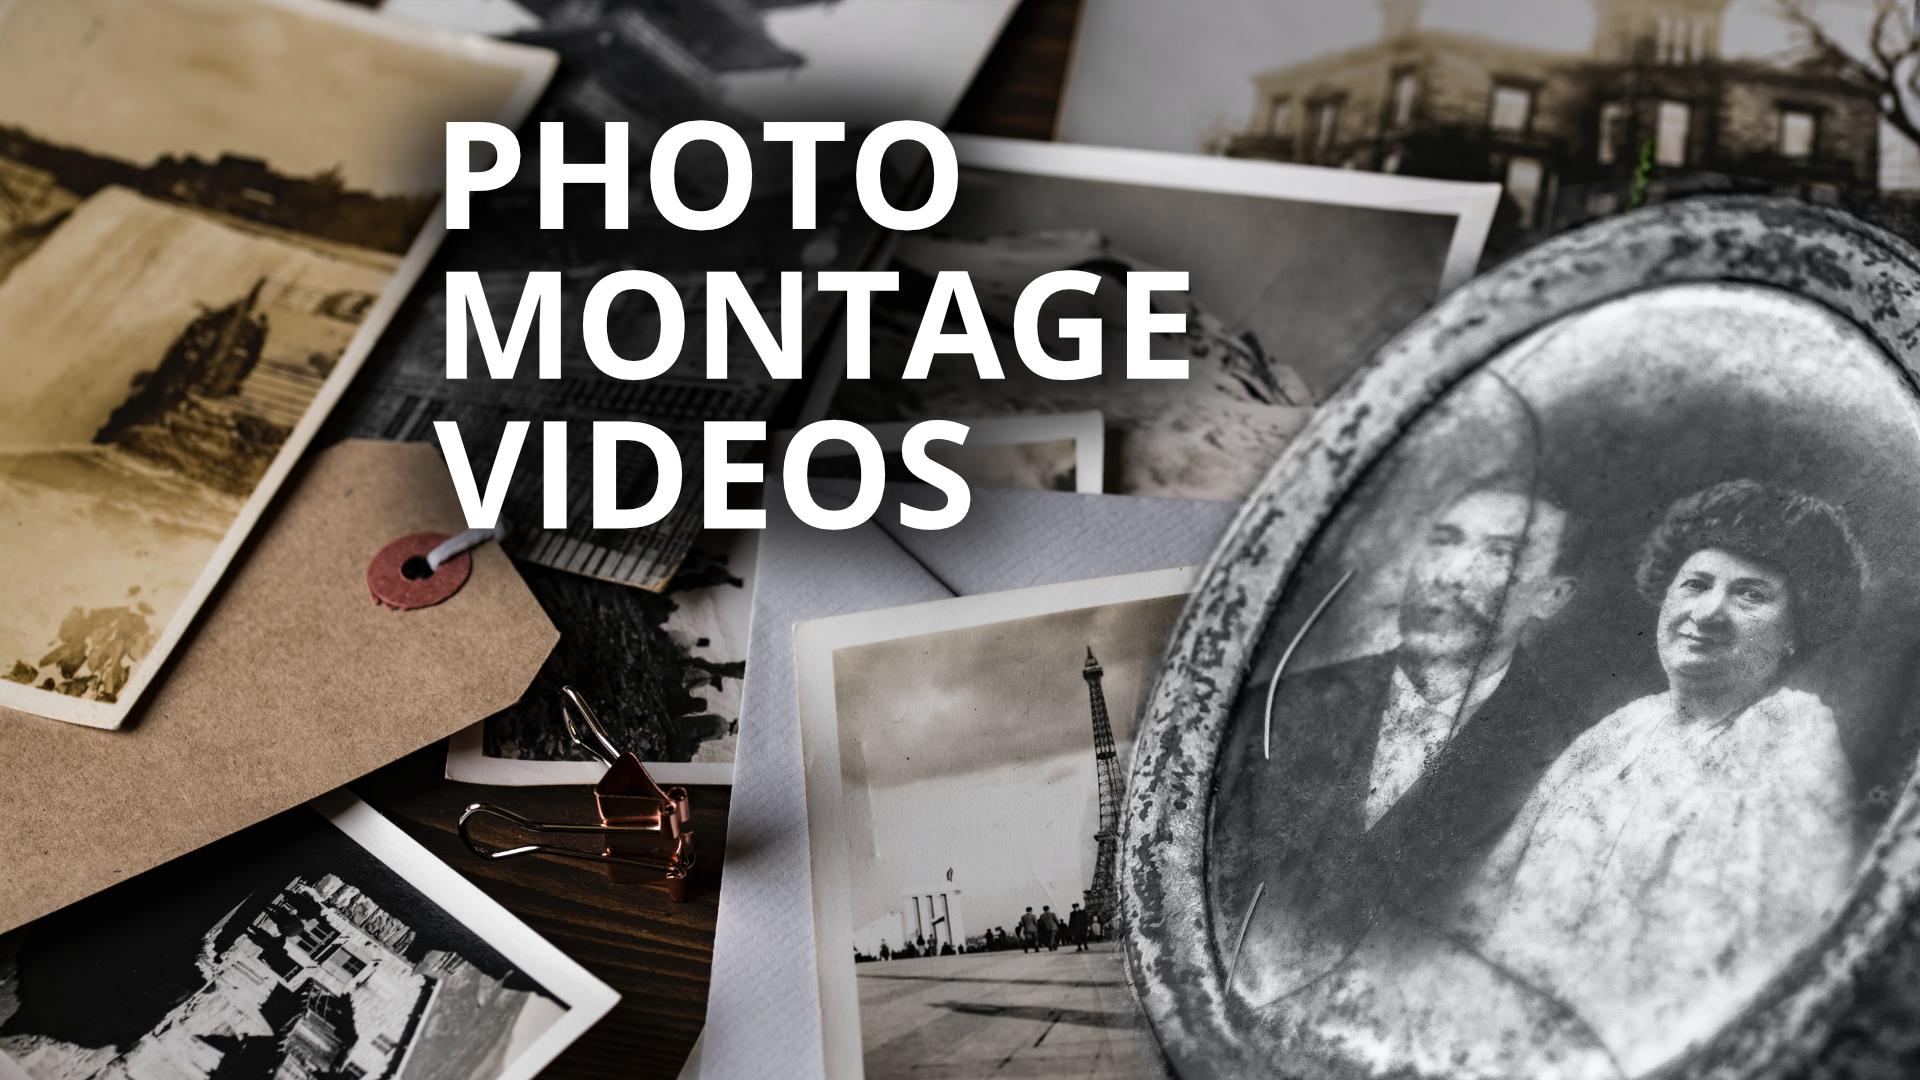 Photo Montage Videos